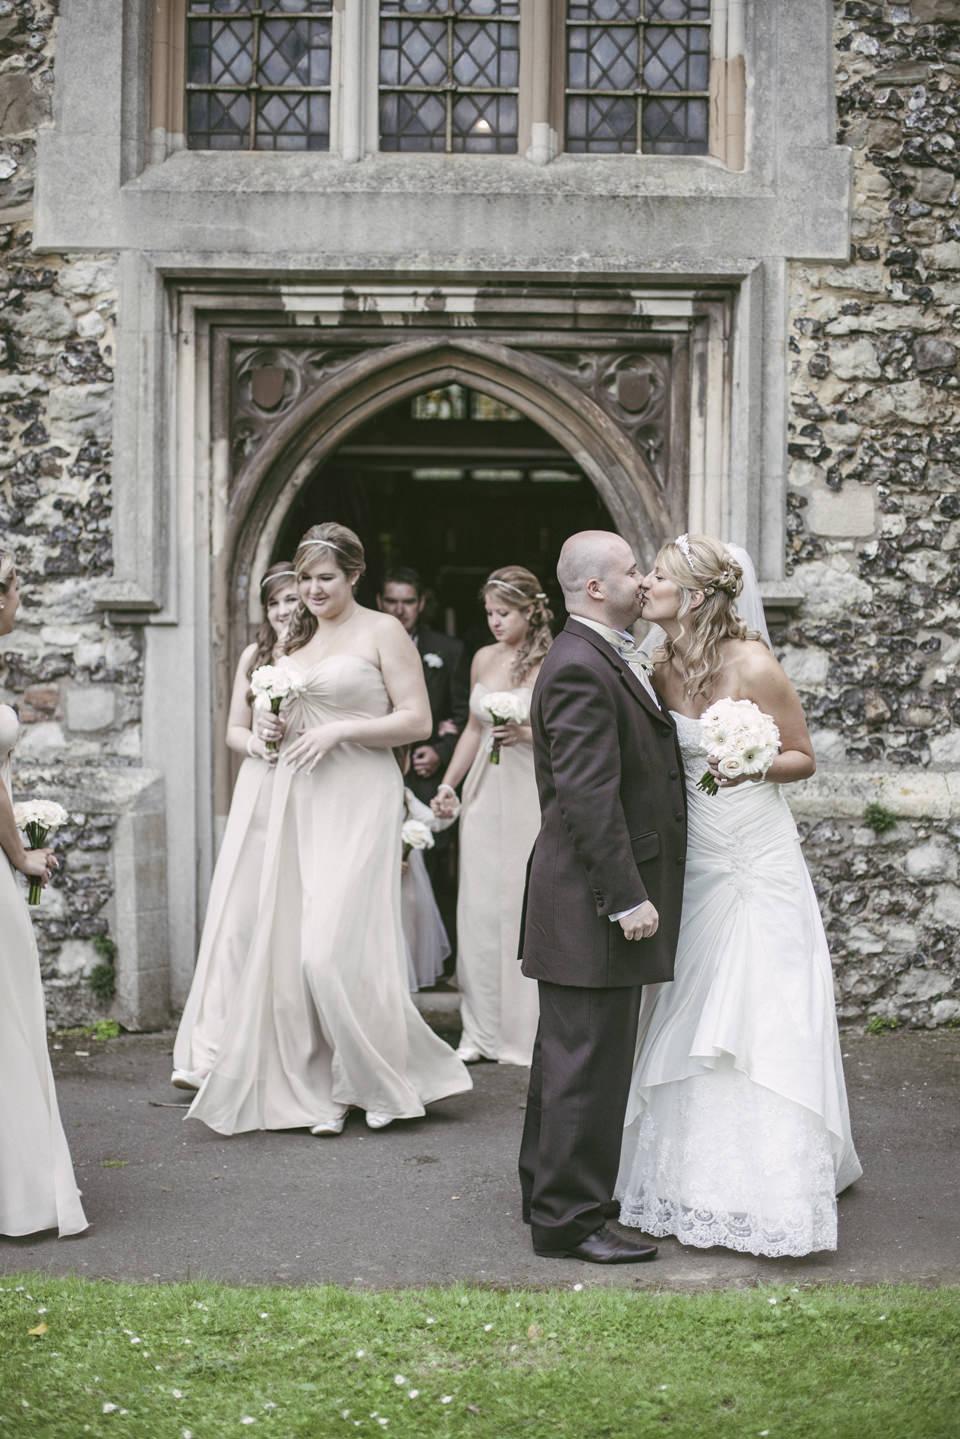 Nicola scott uk wedding photographs (51)